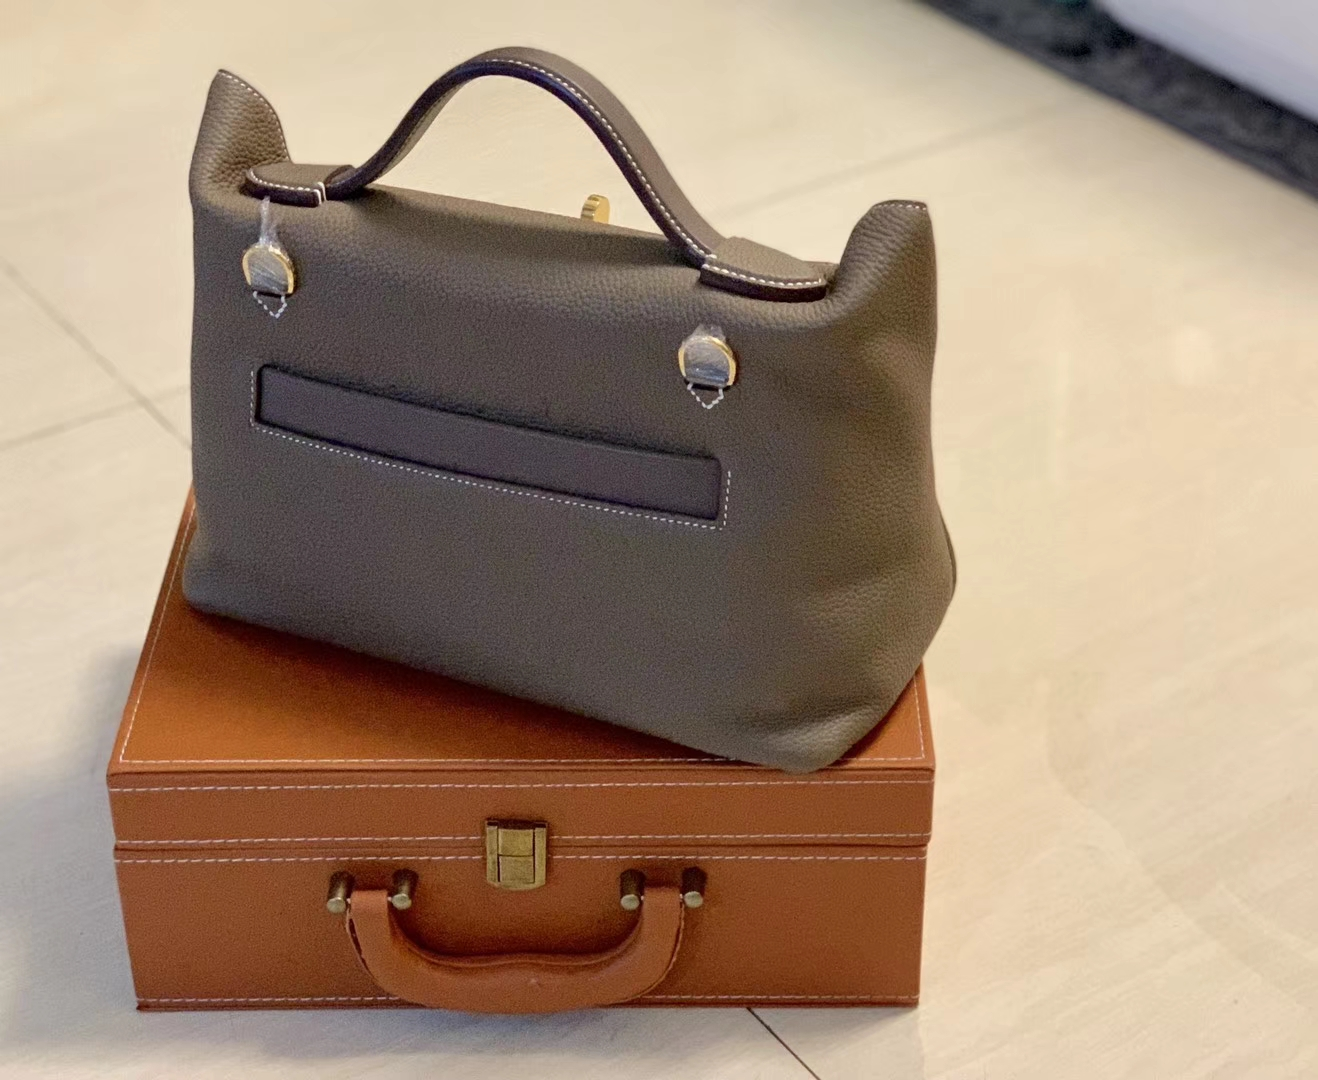 Hermès(爱马仕)Kelly-2424 锡器灰 原厂御用顶级小牛皮拼Swift皮 togo 金扣 29cm